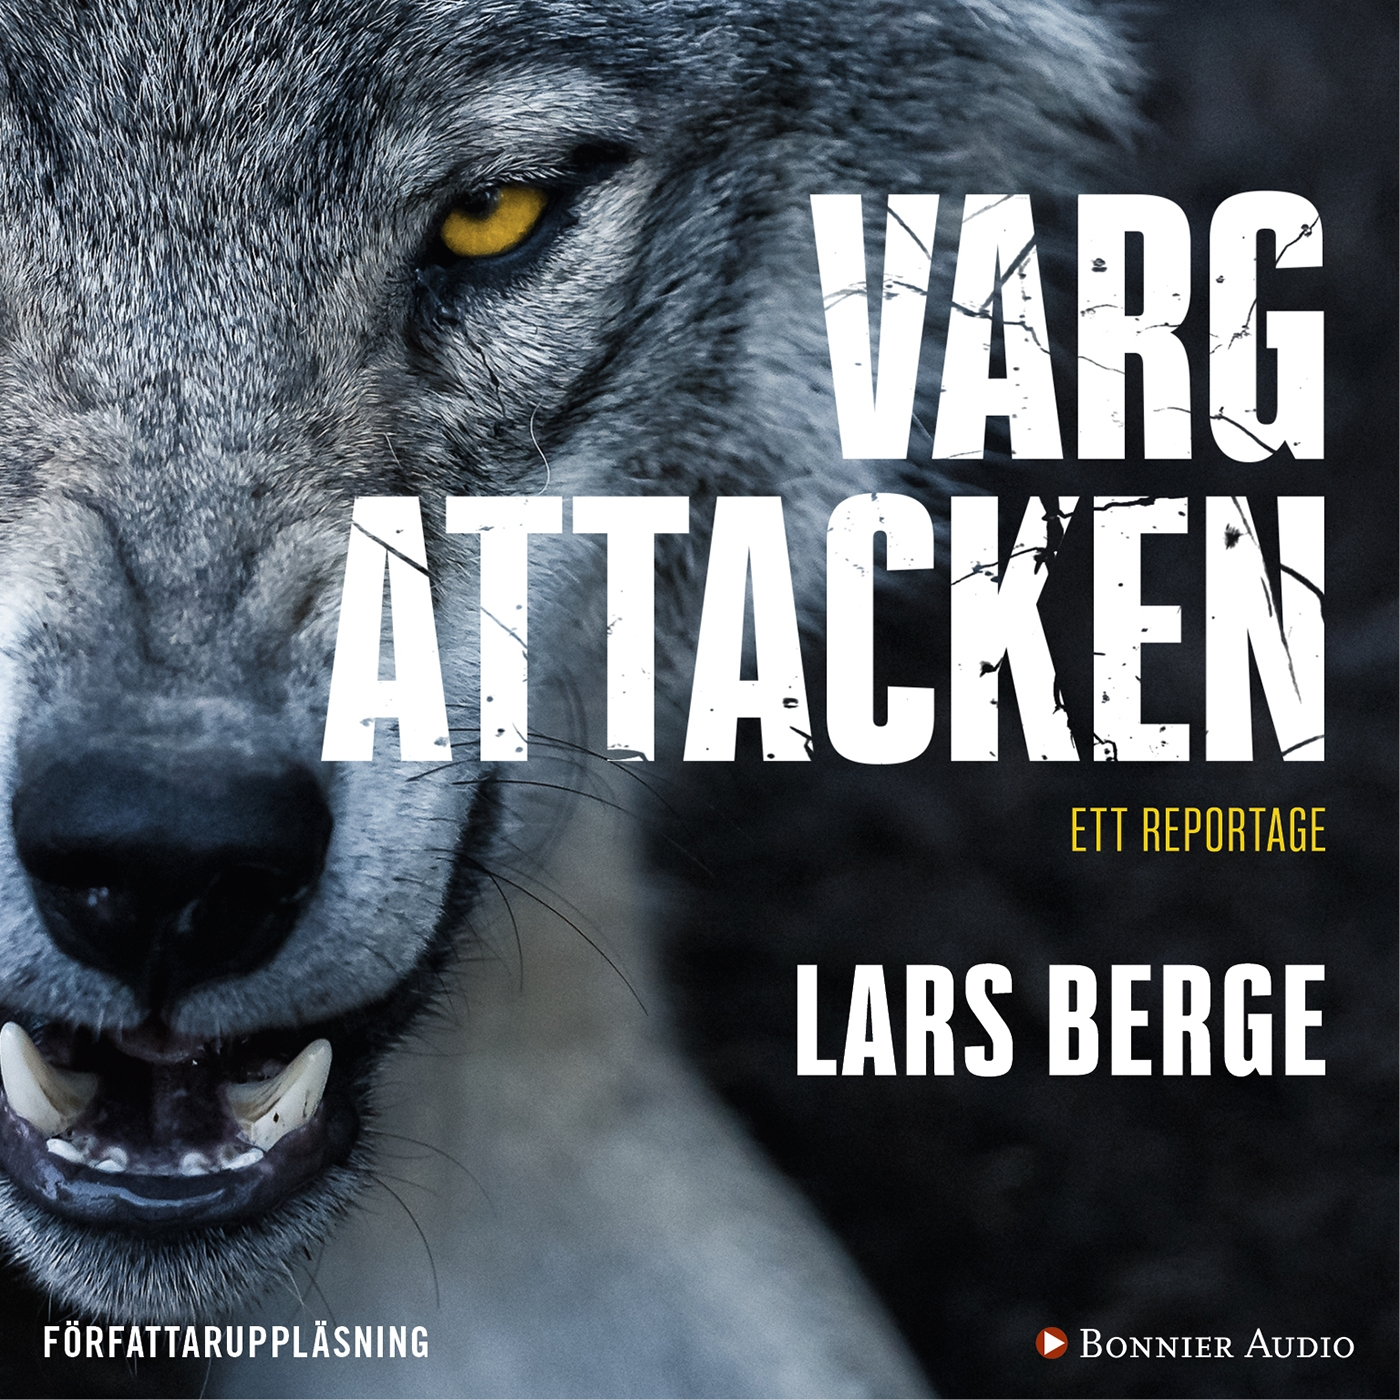 Vargattacken av Lars Berge